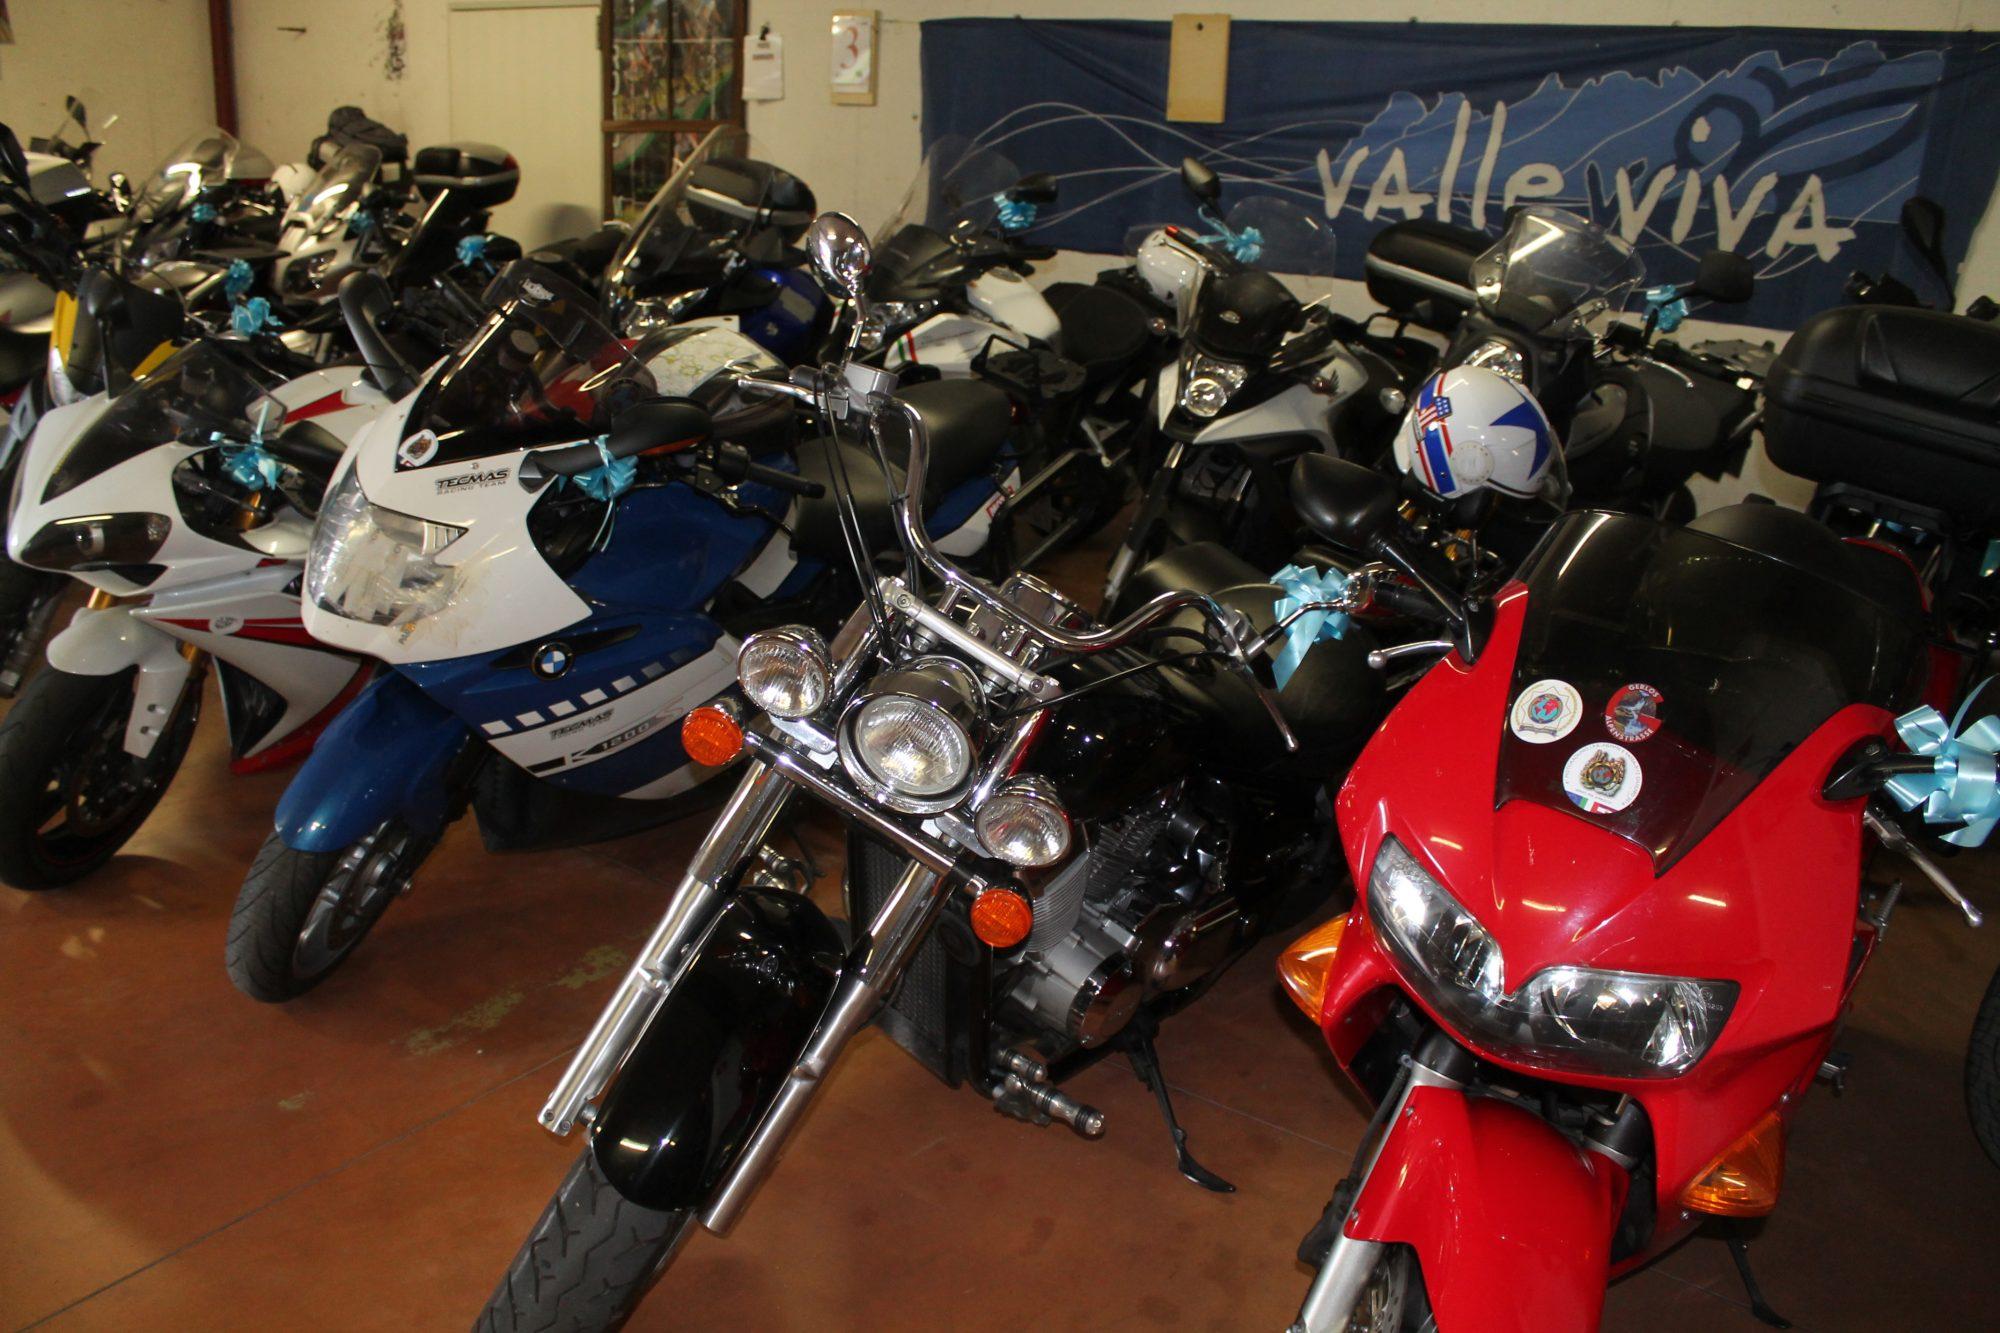 garage moto albergo apnorama